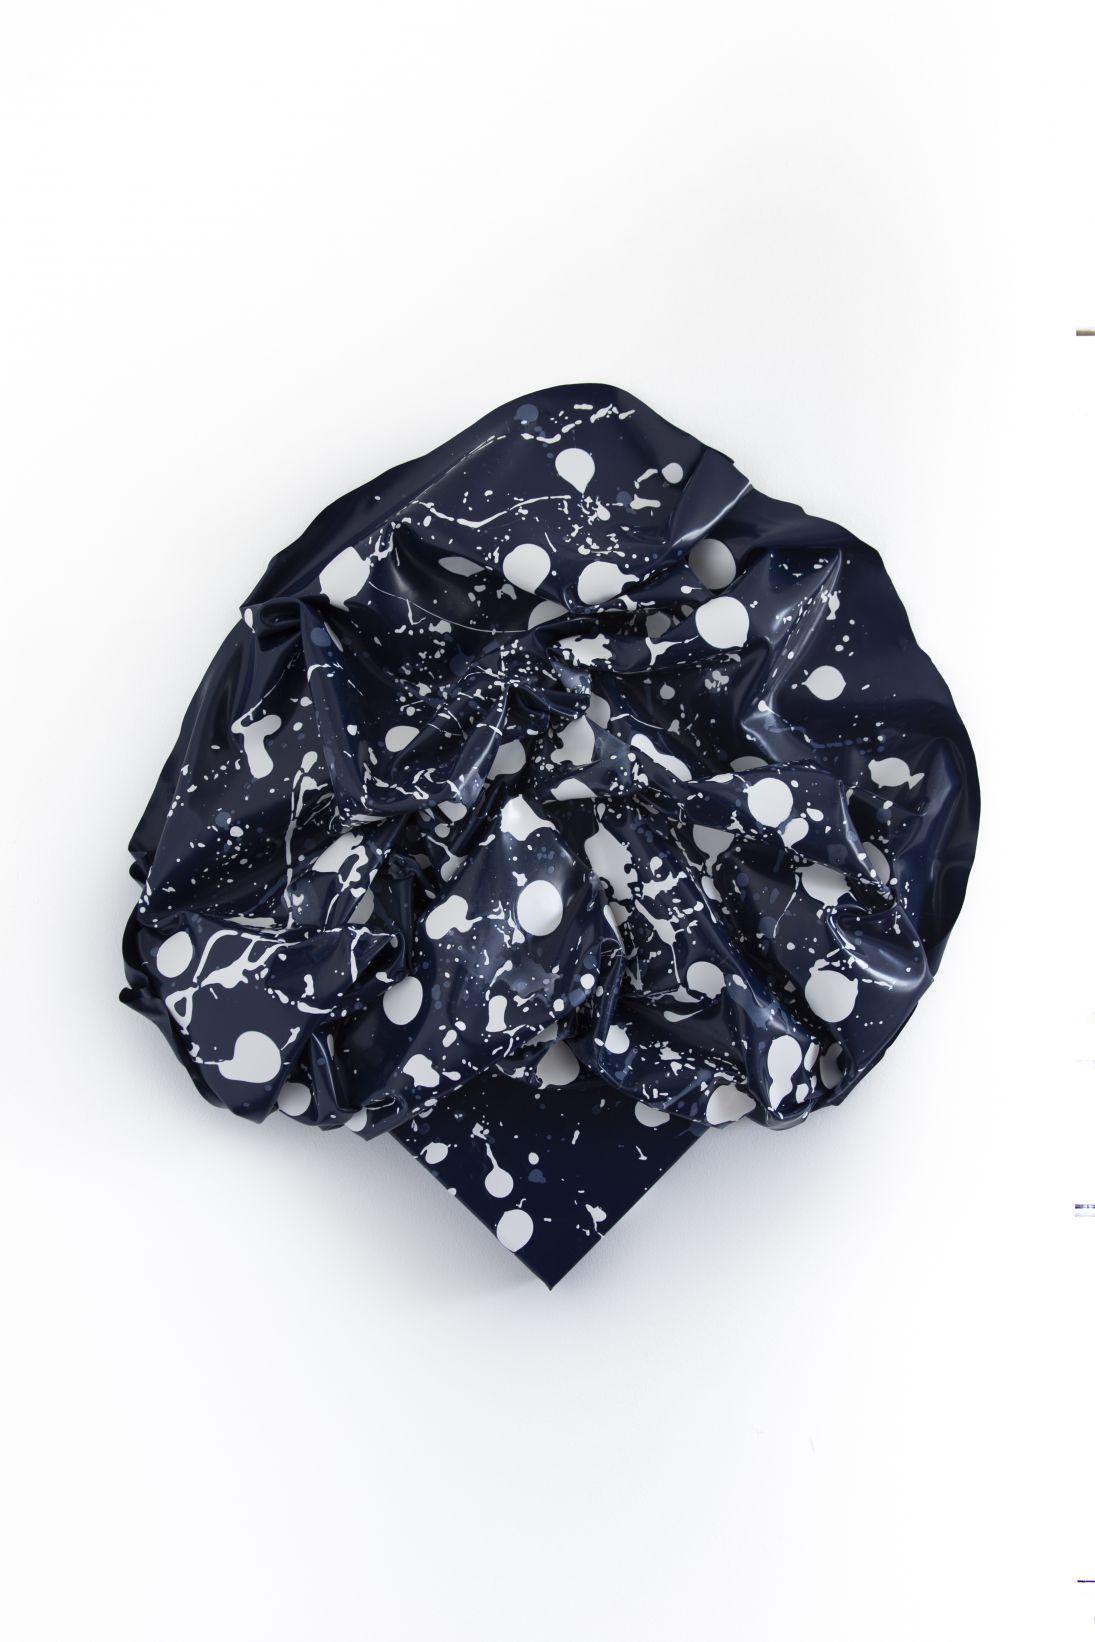 Botánica Cósmica (2018) - Ignacio Muv